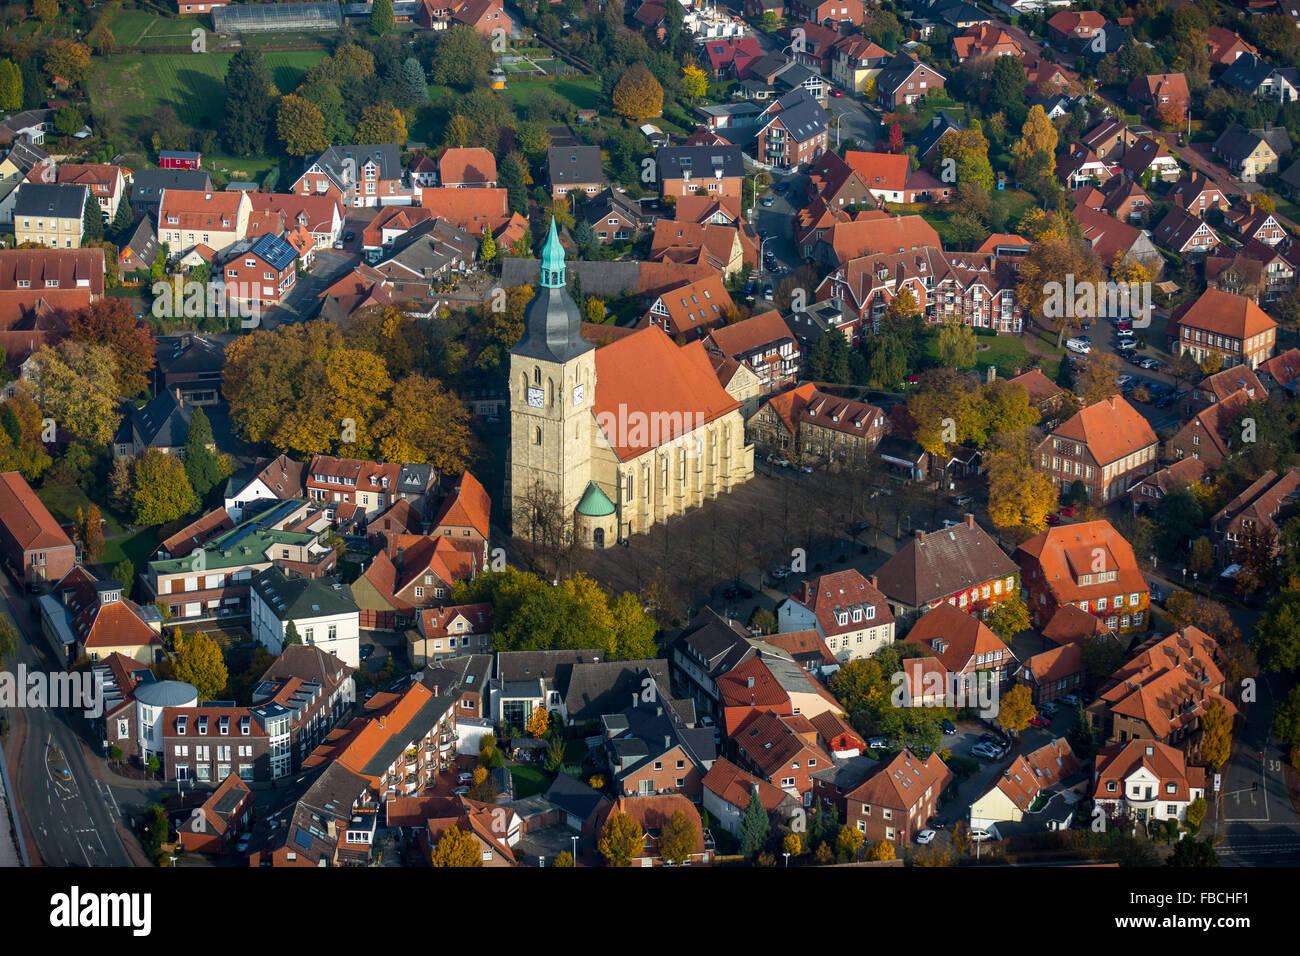 Aerial view, city center, St. Martinus Church Nottuln, red tile roofs, Nottuln, Münsterland, North Rhine-Westphalia, - Stock Image